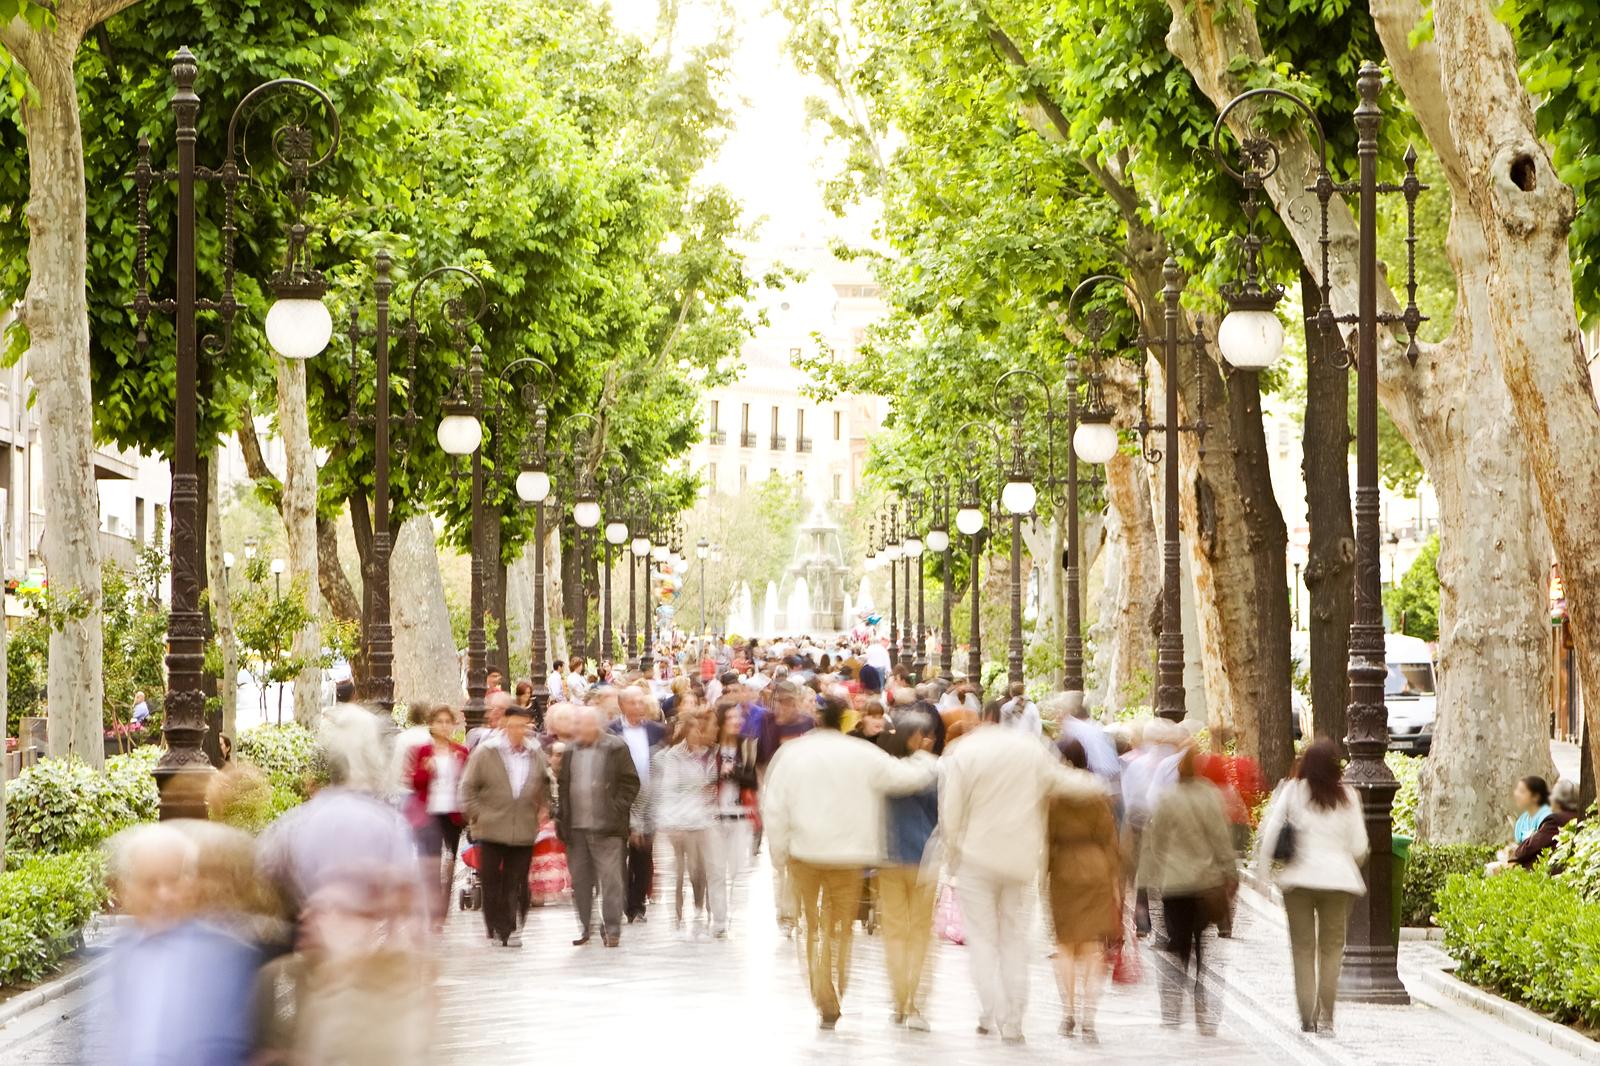 bigstock-Blurred-crowd-in-the-street-h-28910135.jpg